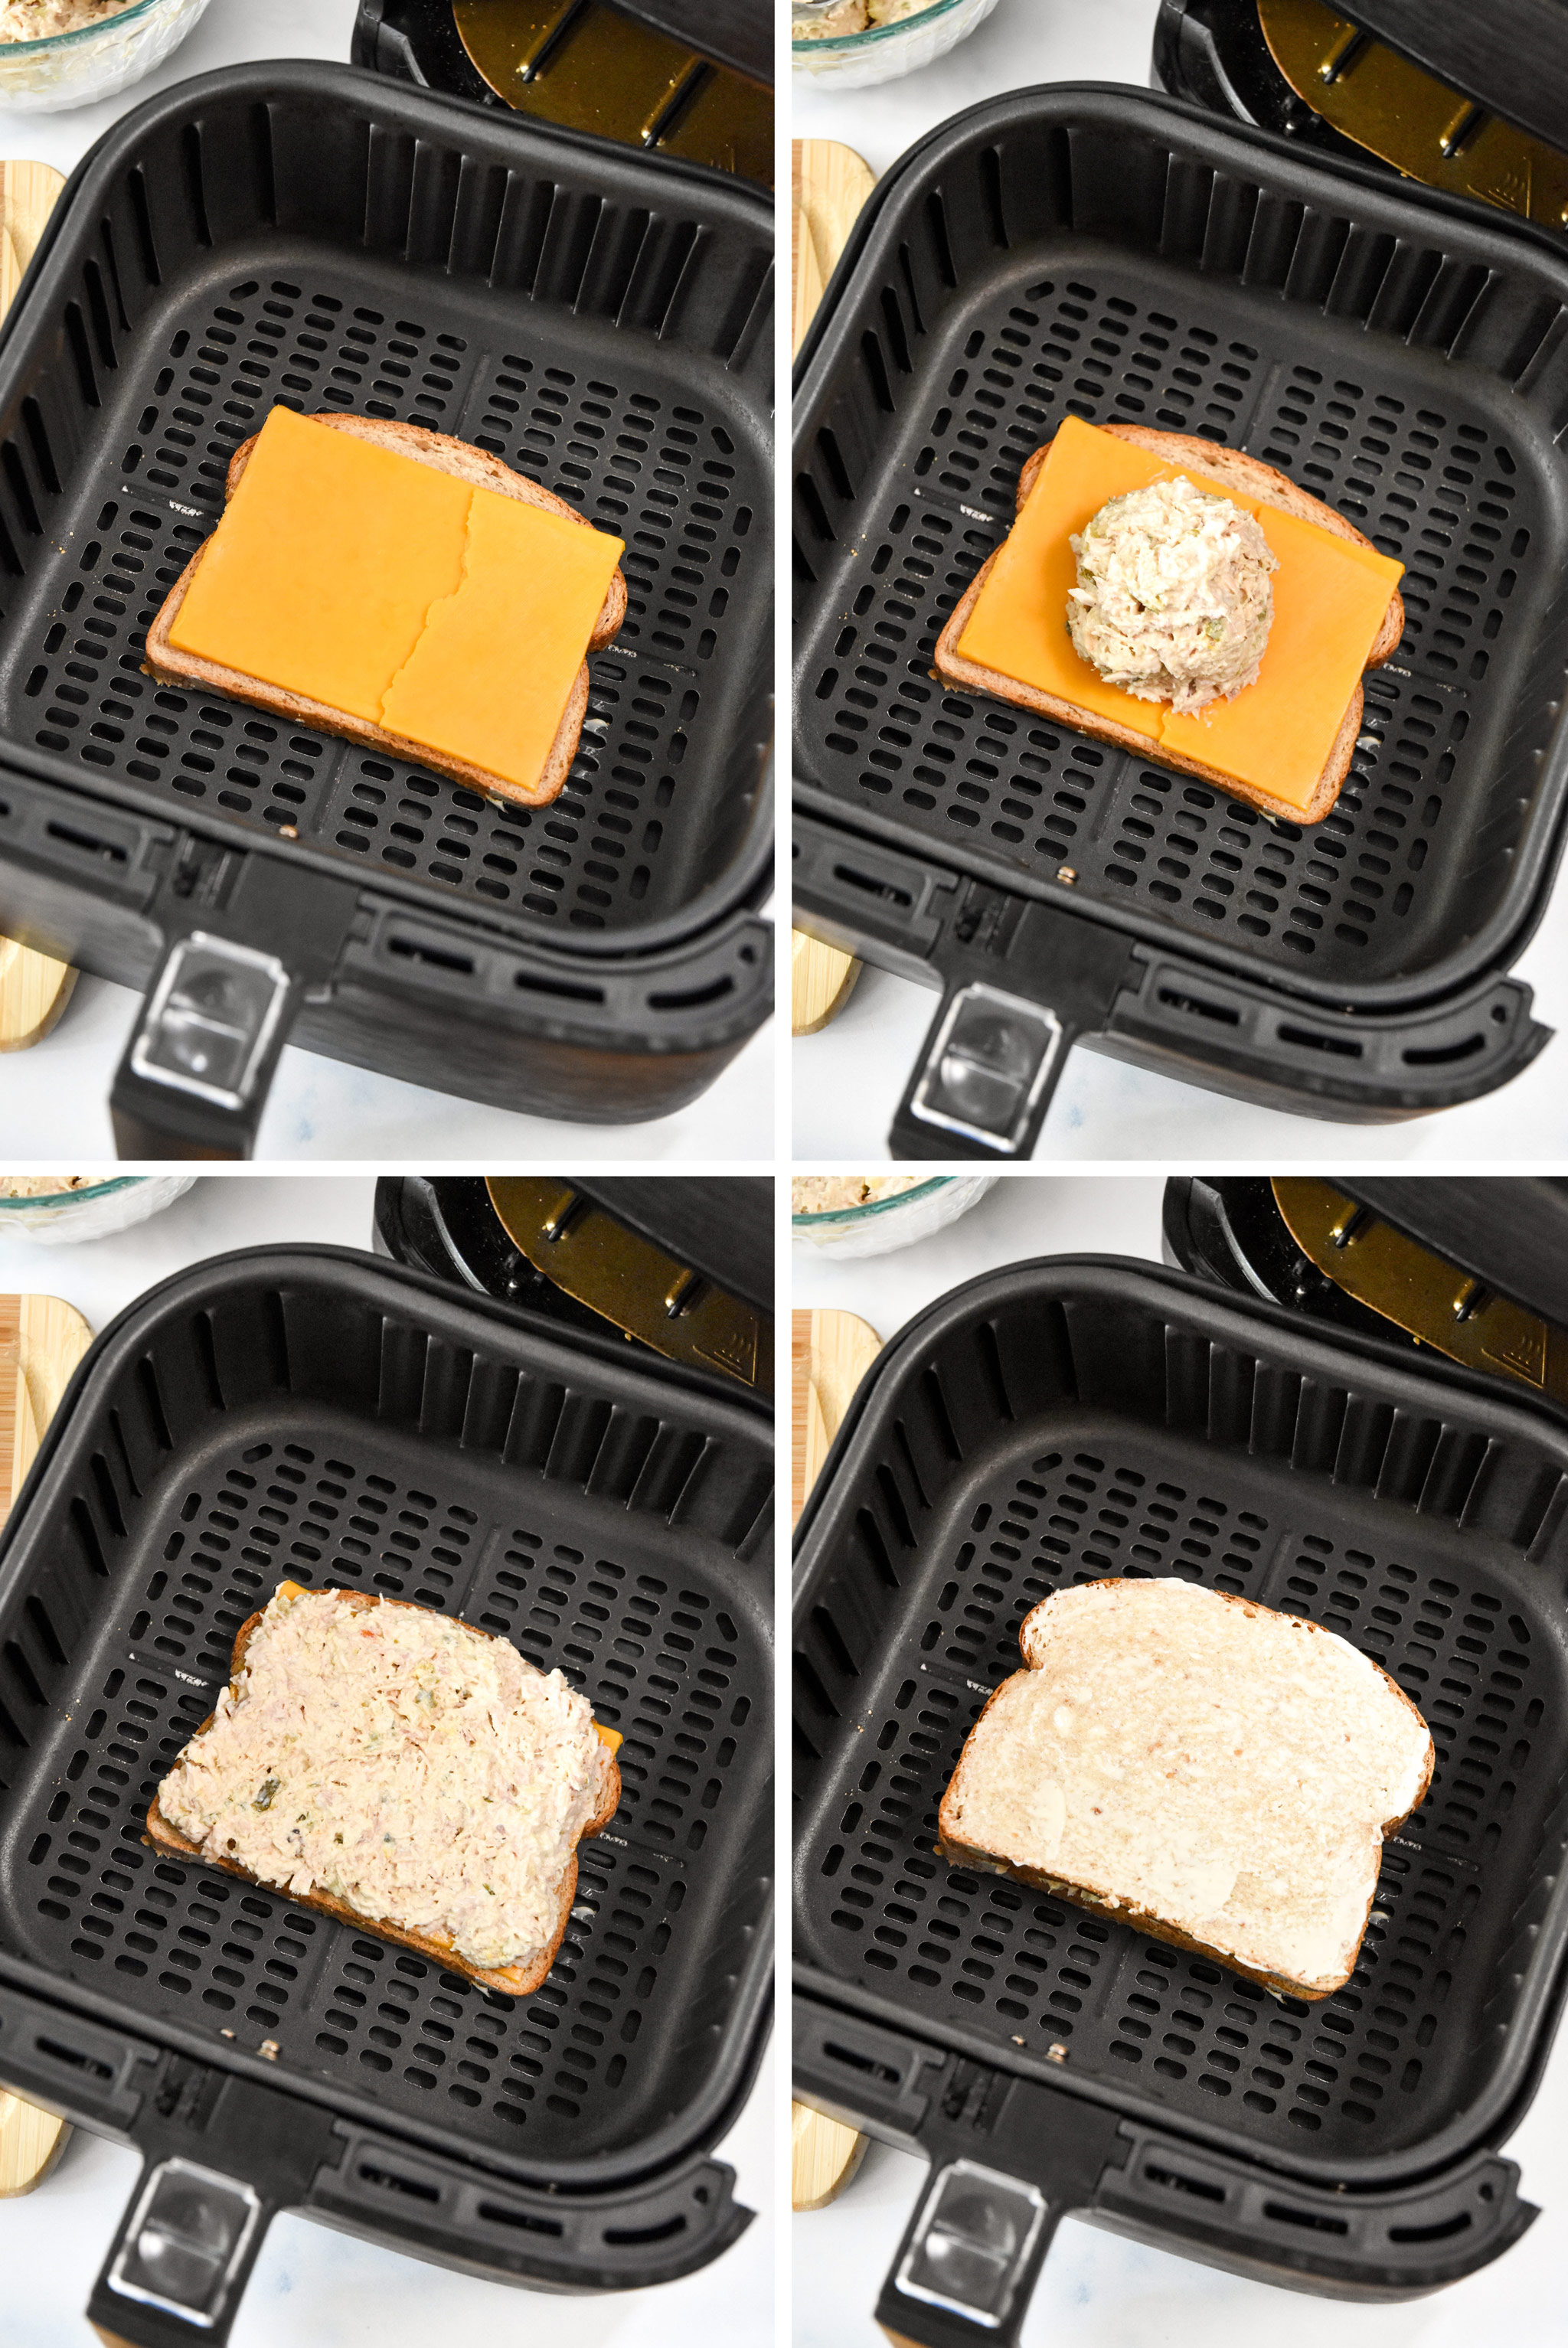 4 steps for assembling the air fryer tuna sandwich.